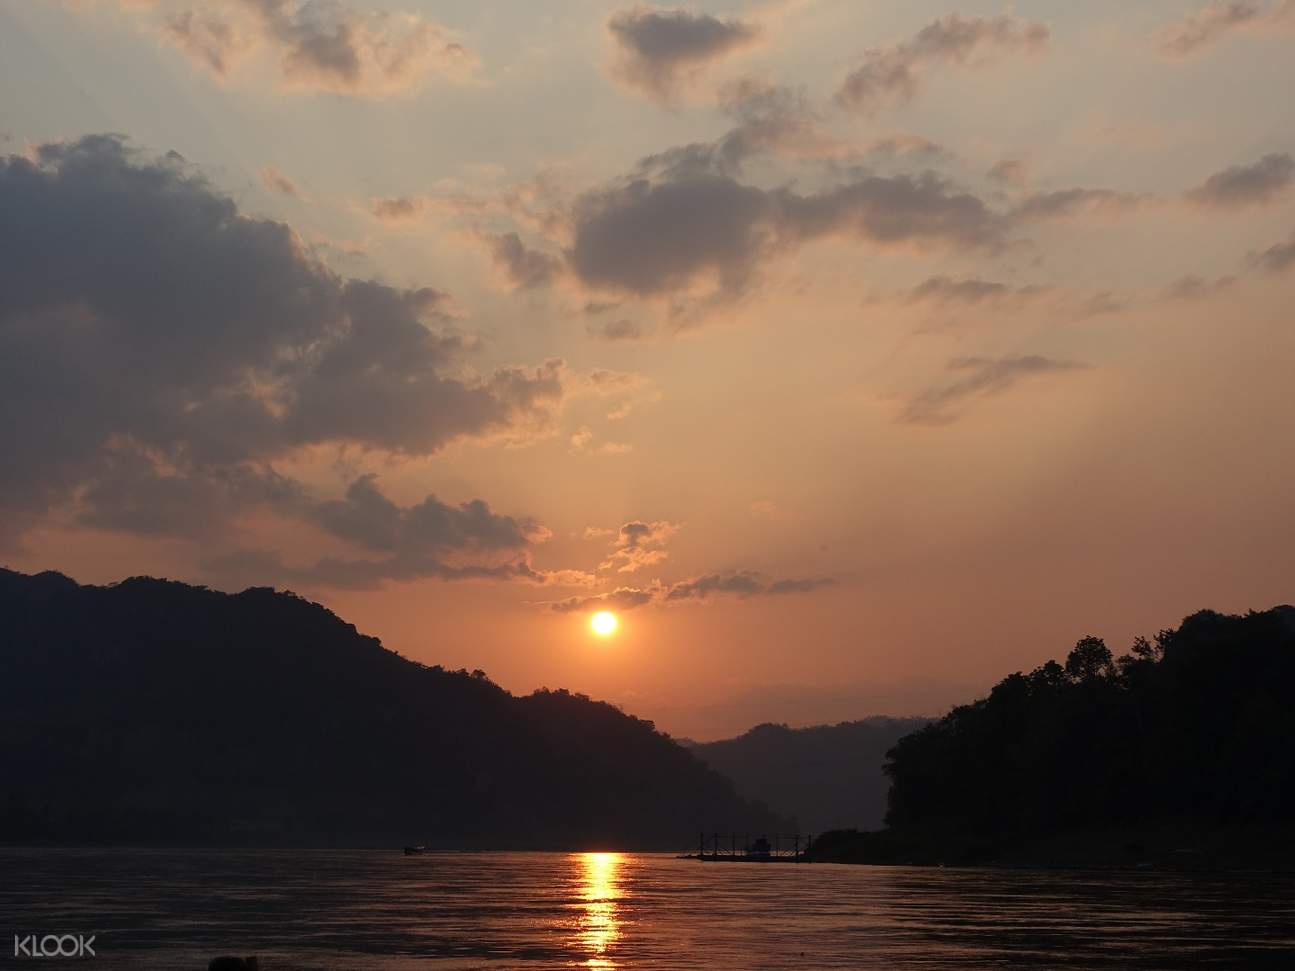 Sunset Over Luang Prabang